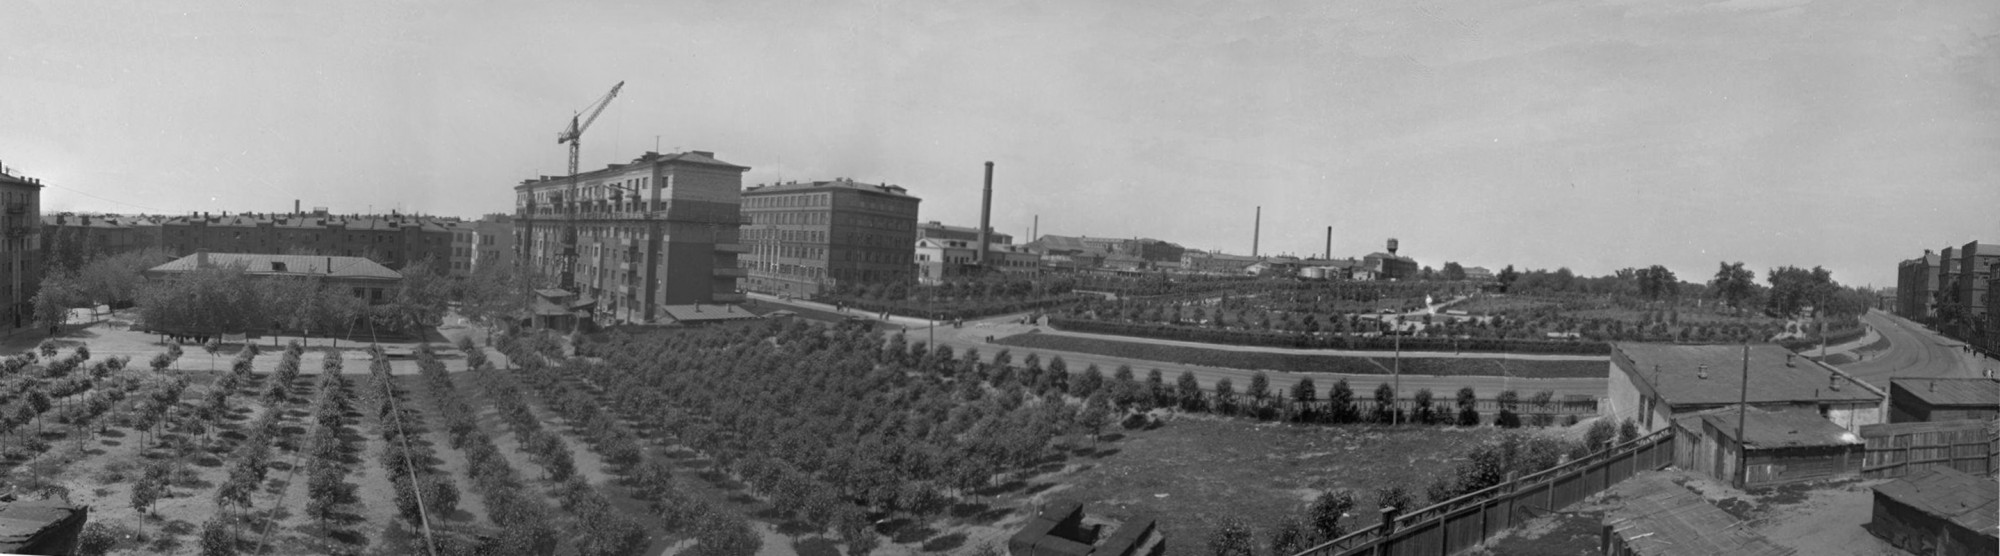 1952 Пресненский район Москвы (панорама). Петков И.5а